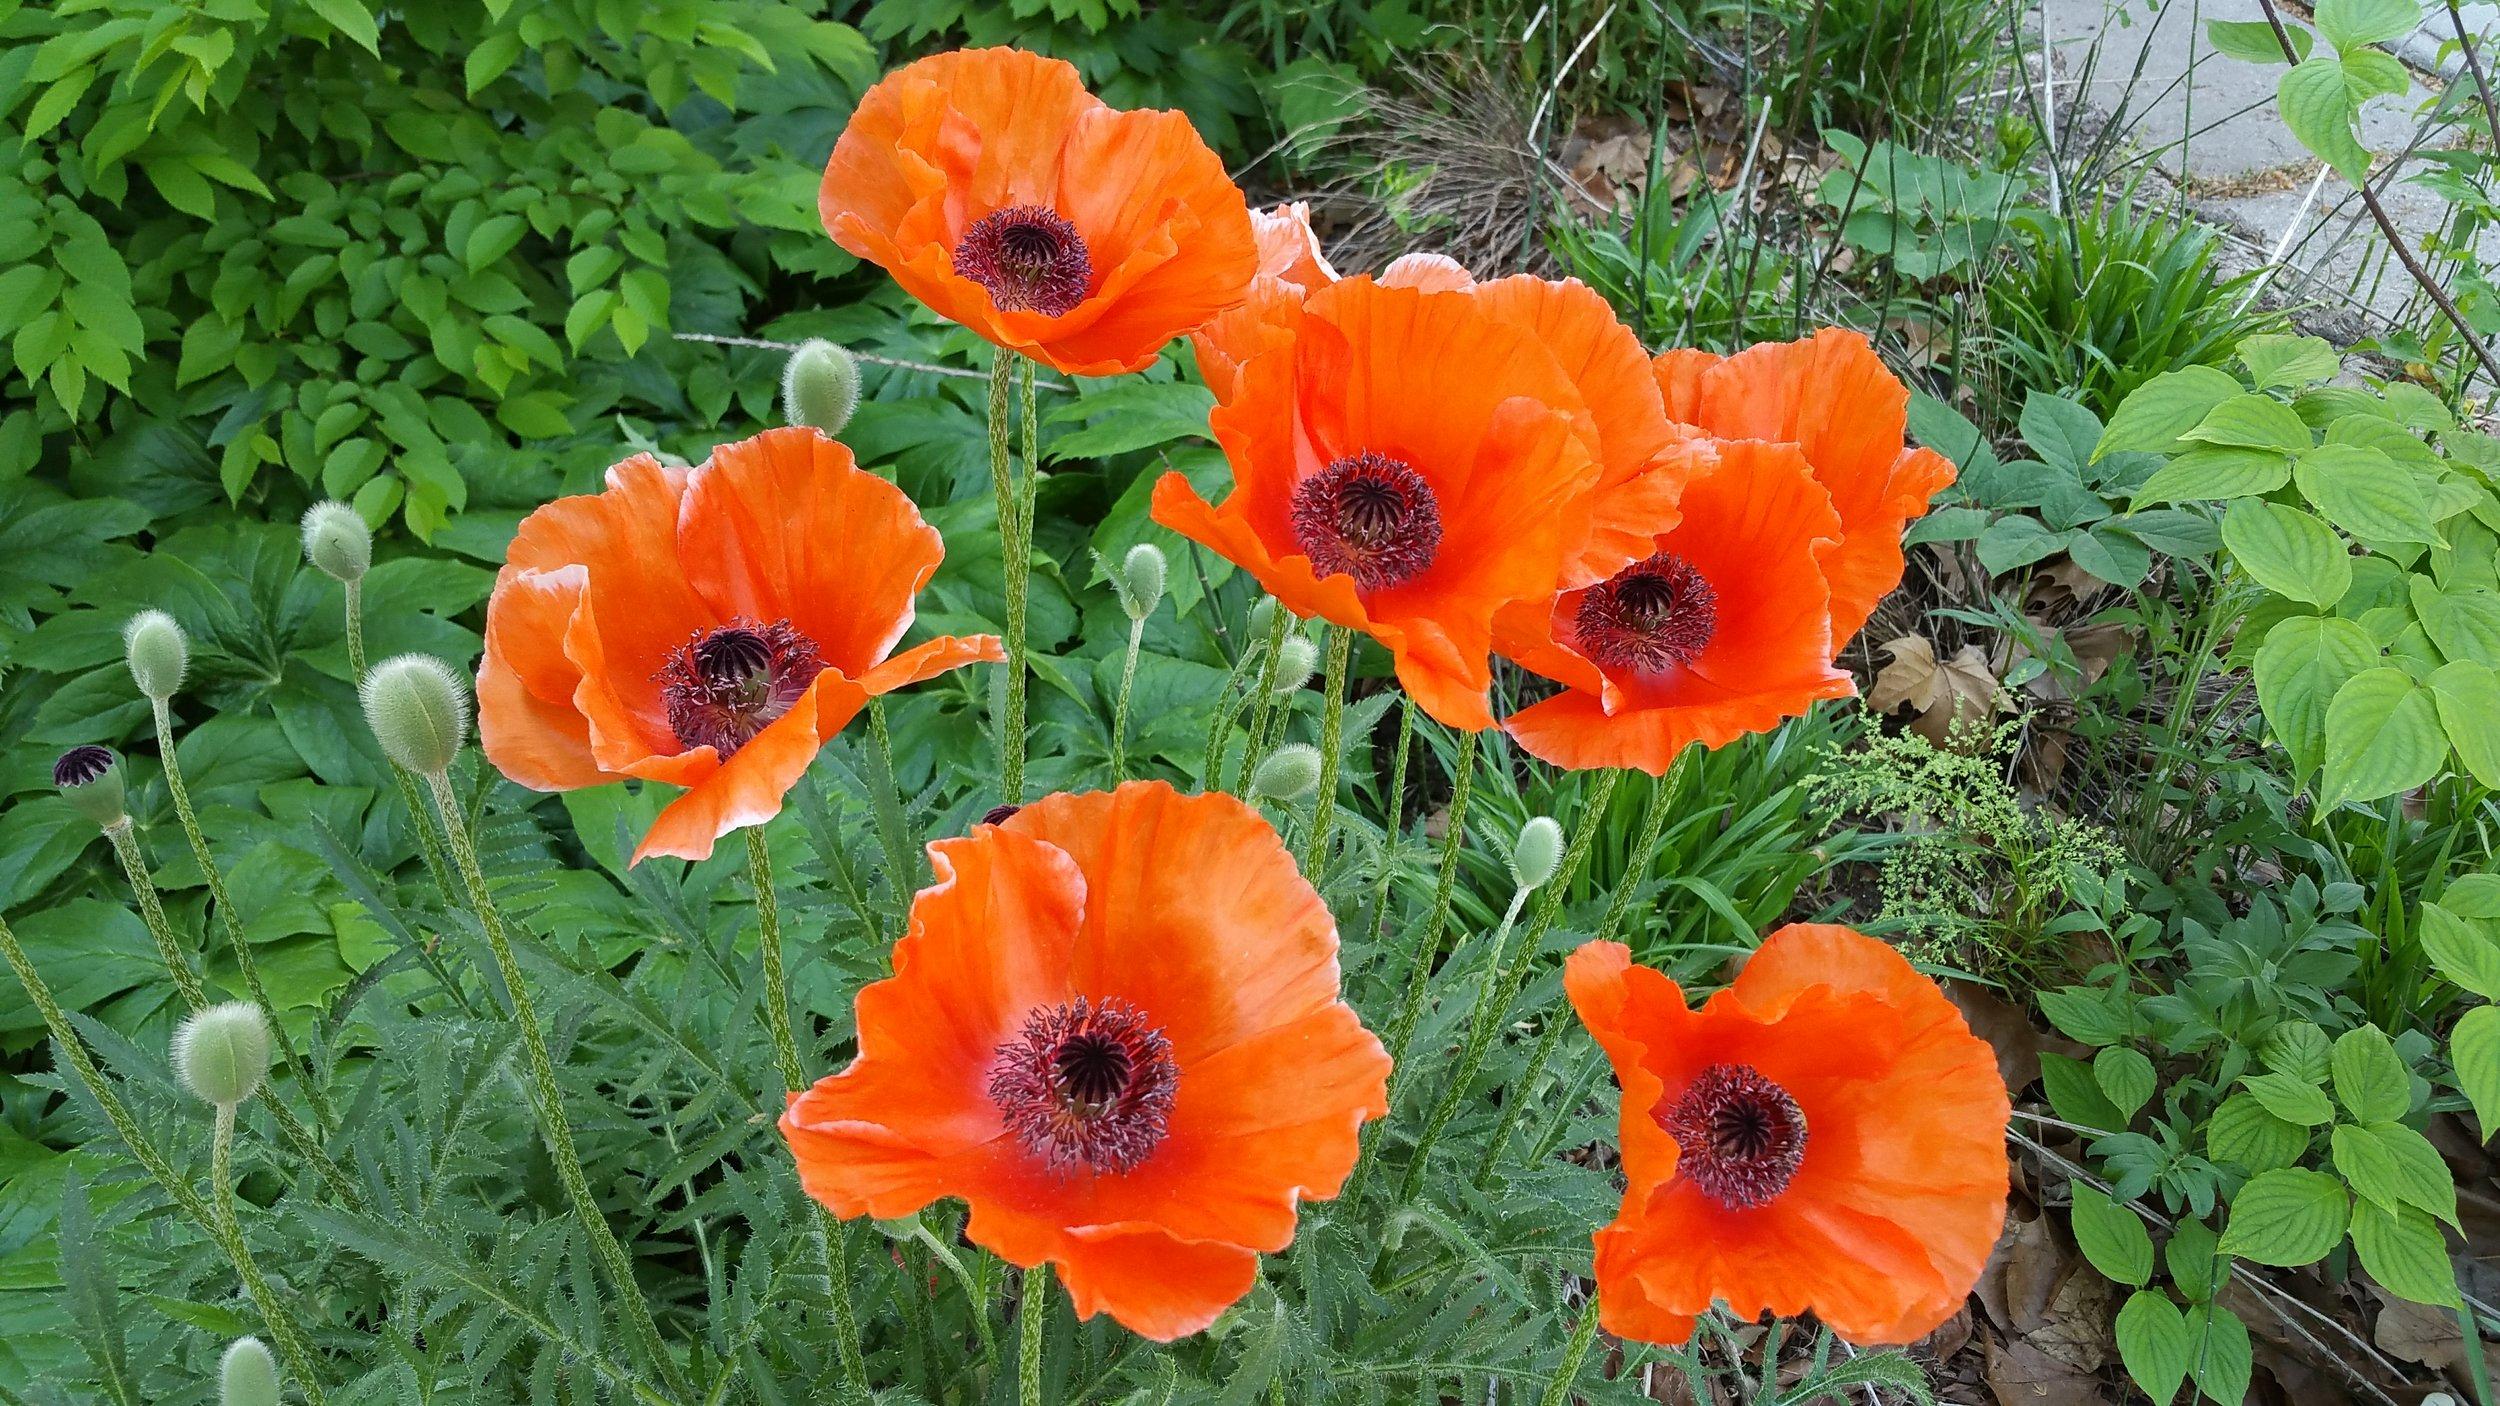 Poppies B Porchuk.jpg